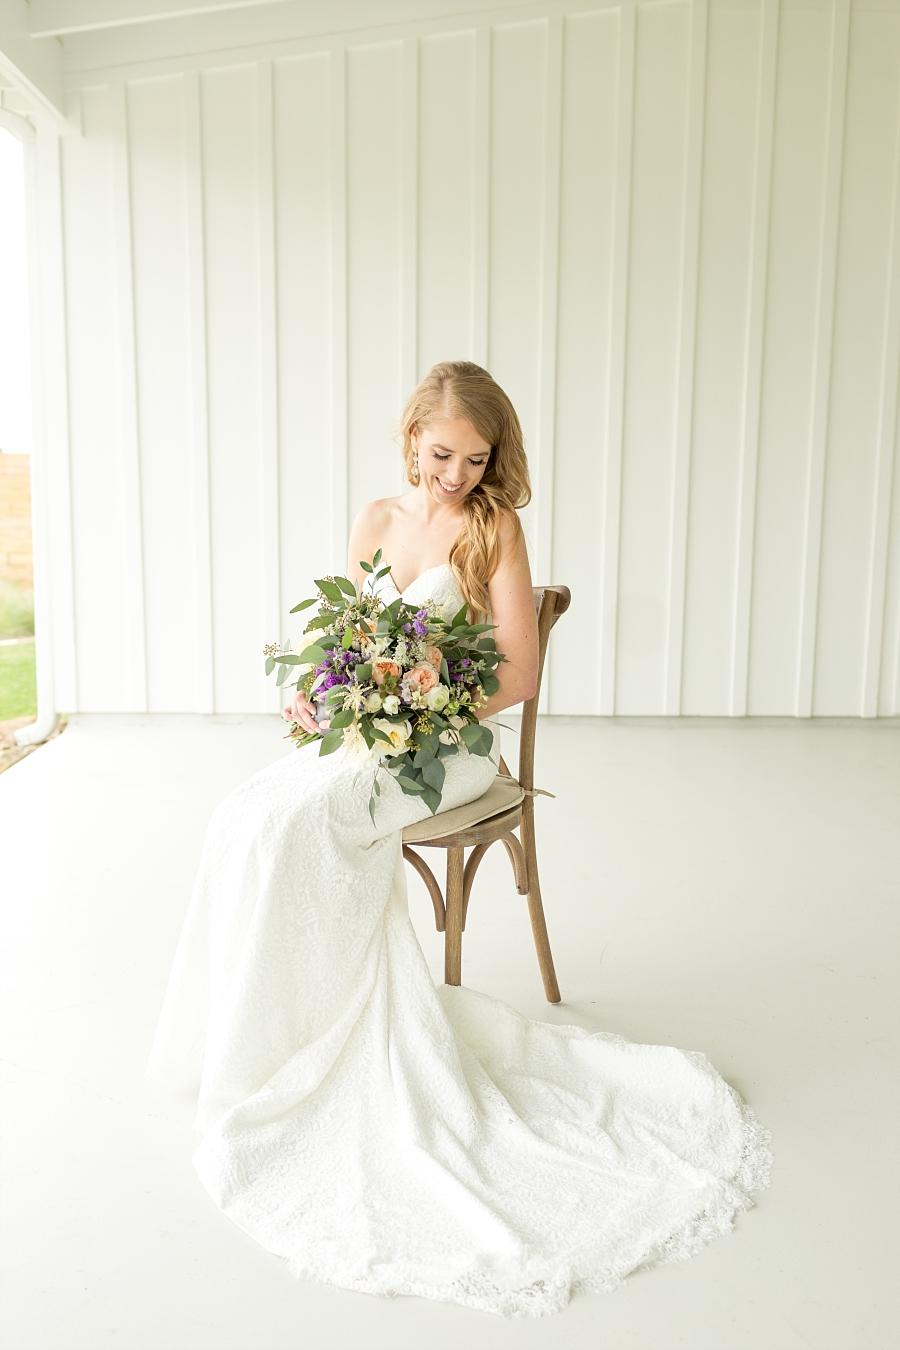 Stacy-Anderson-Photography-The-Farmhouse-Houston-Wedding-Photographer_0096.jpg